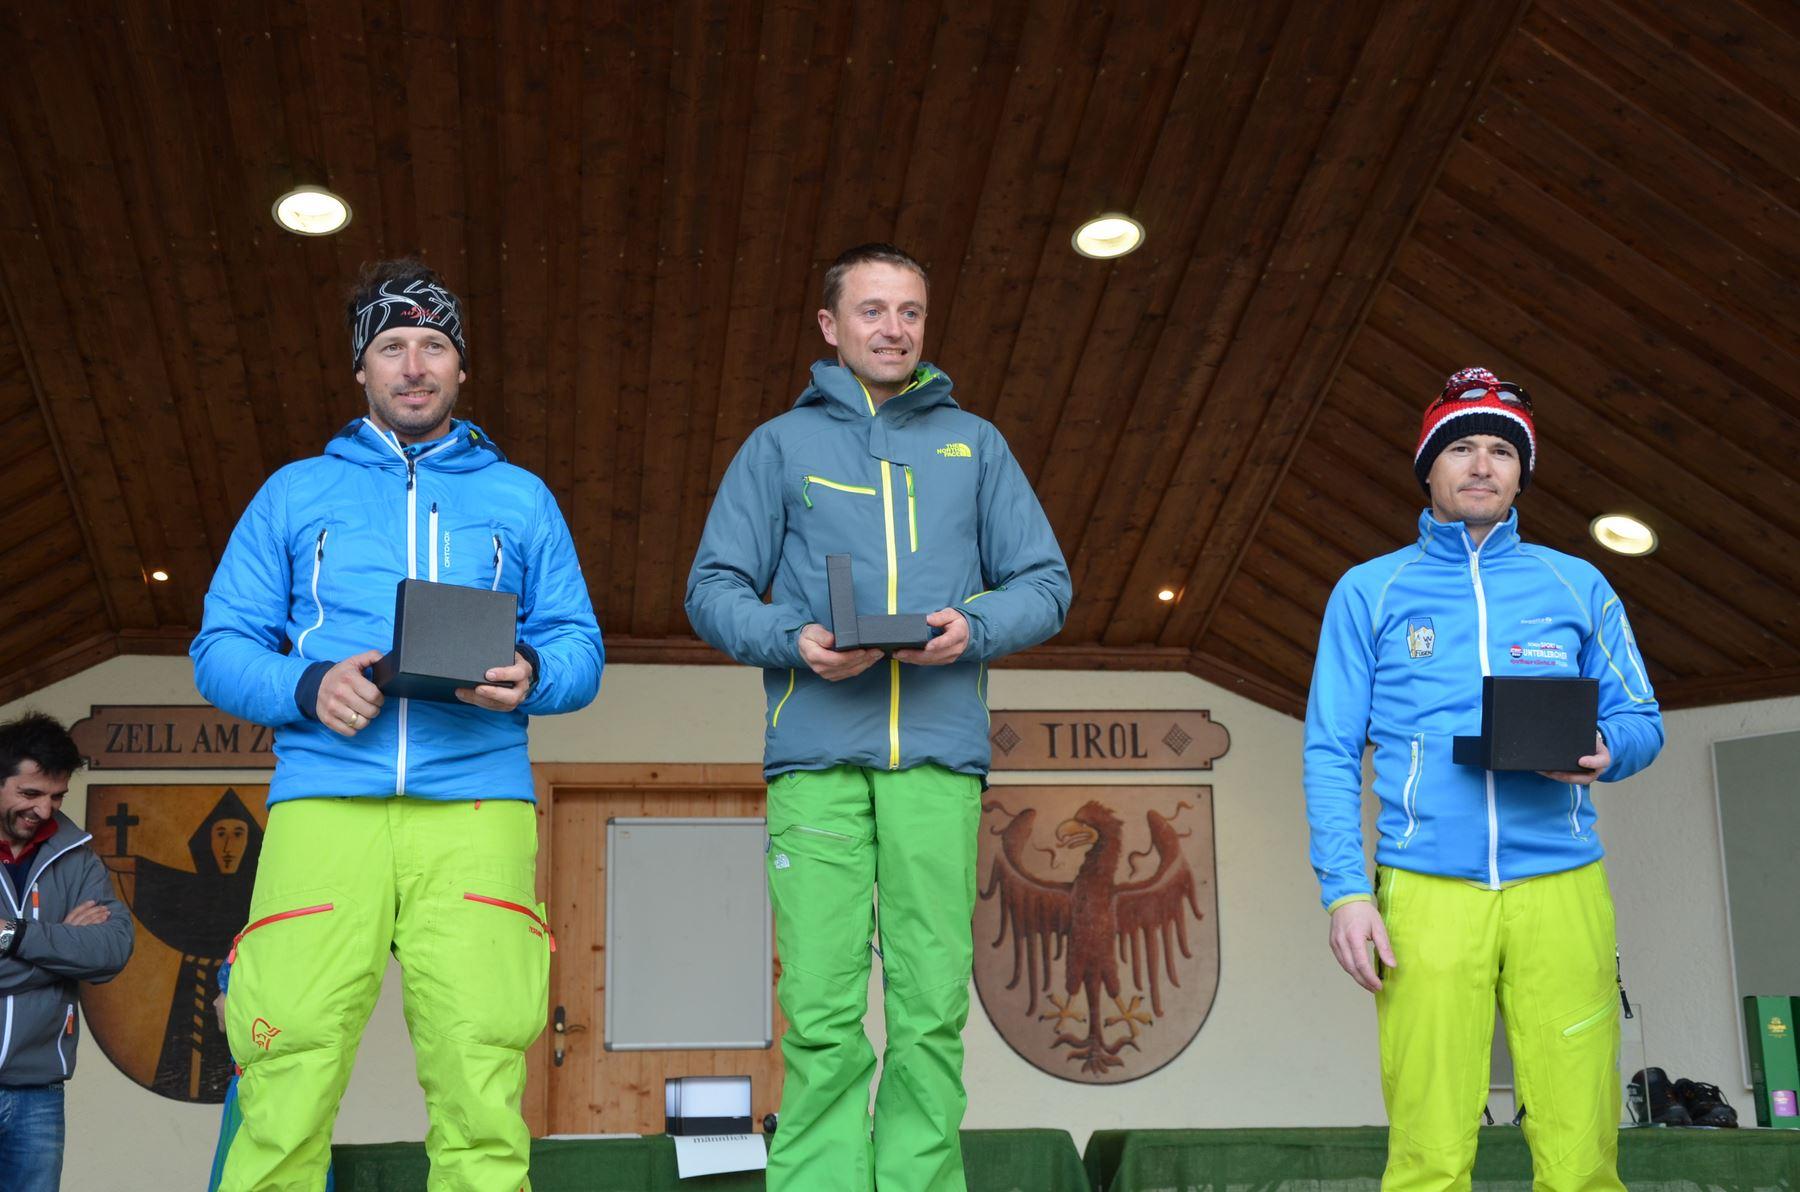 2015-03-22 BV Zillertal Skirennen 475.JPG